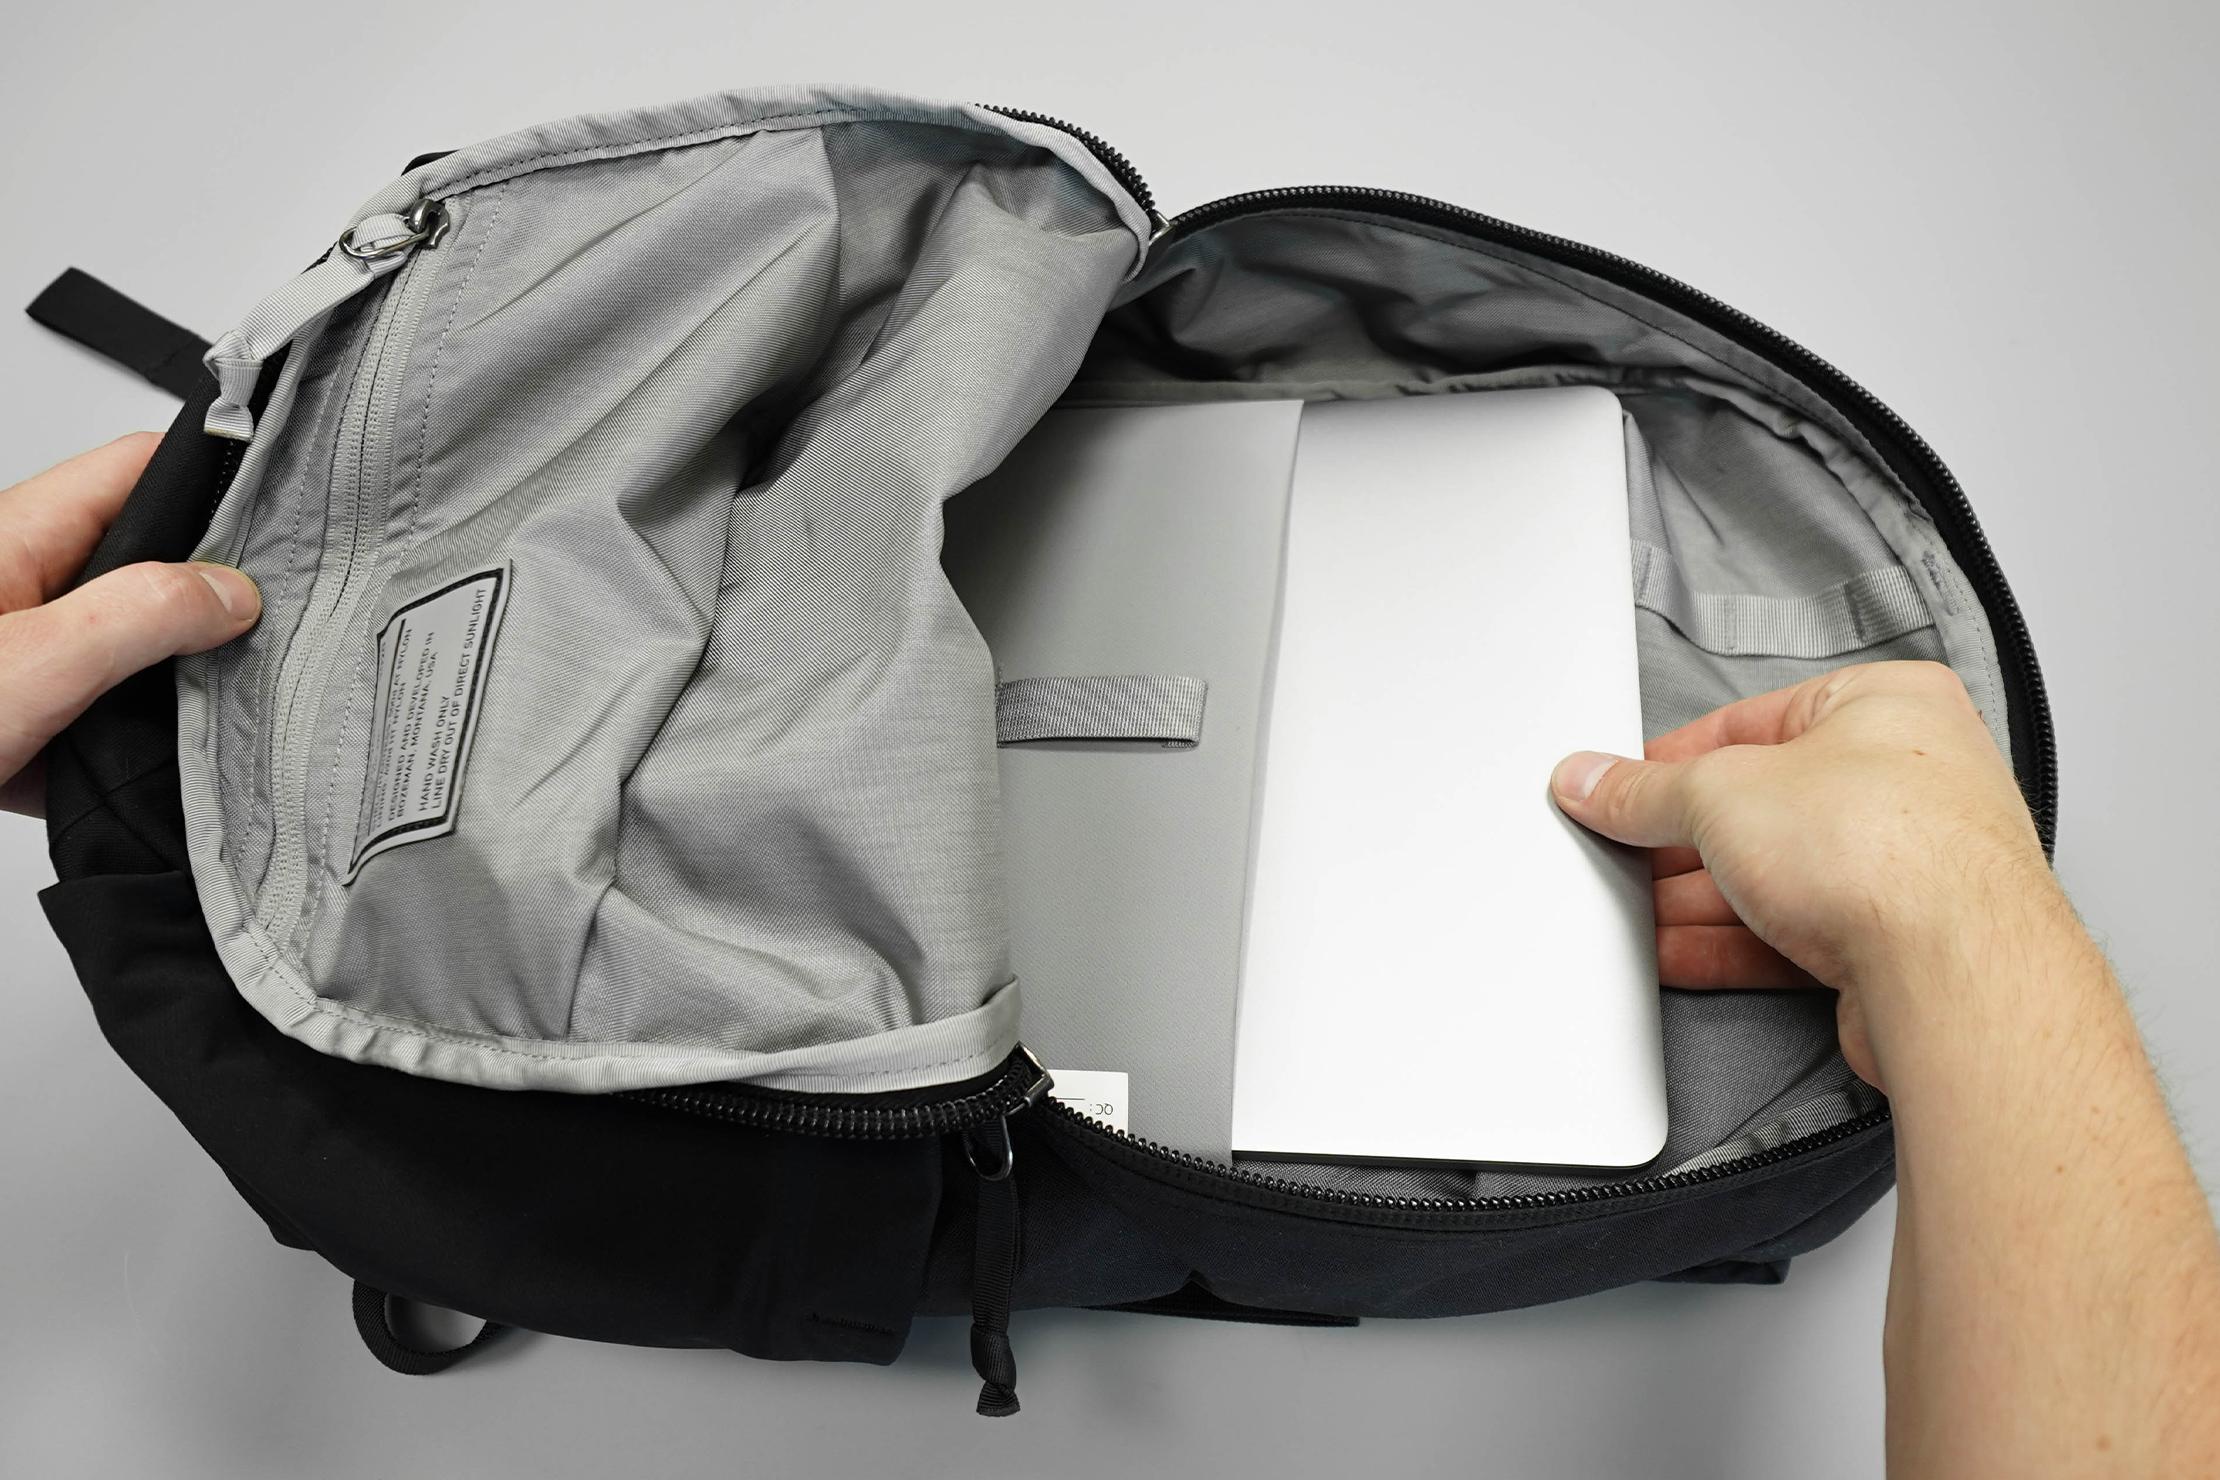 EVERGOODS Civic Half Zip 22 With Laptop In Laptop Sleeve